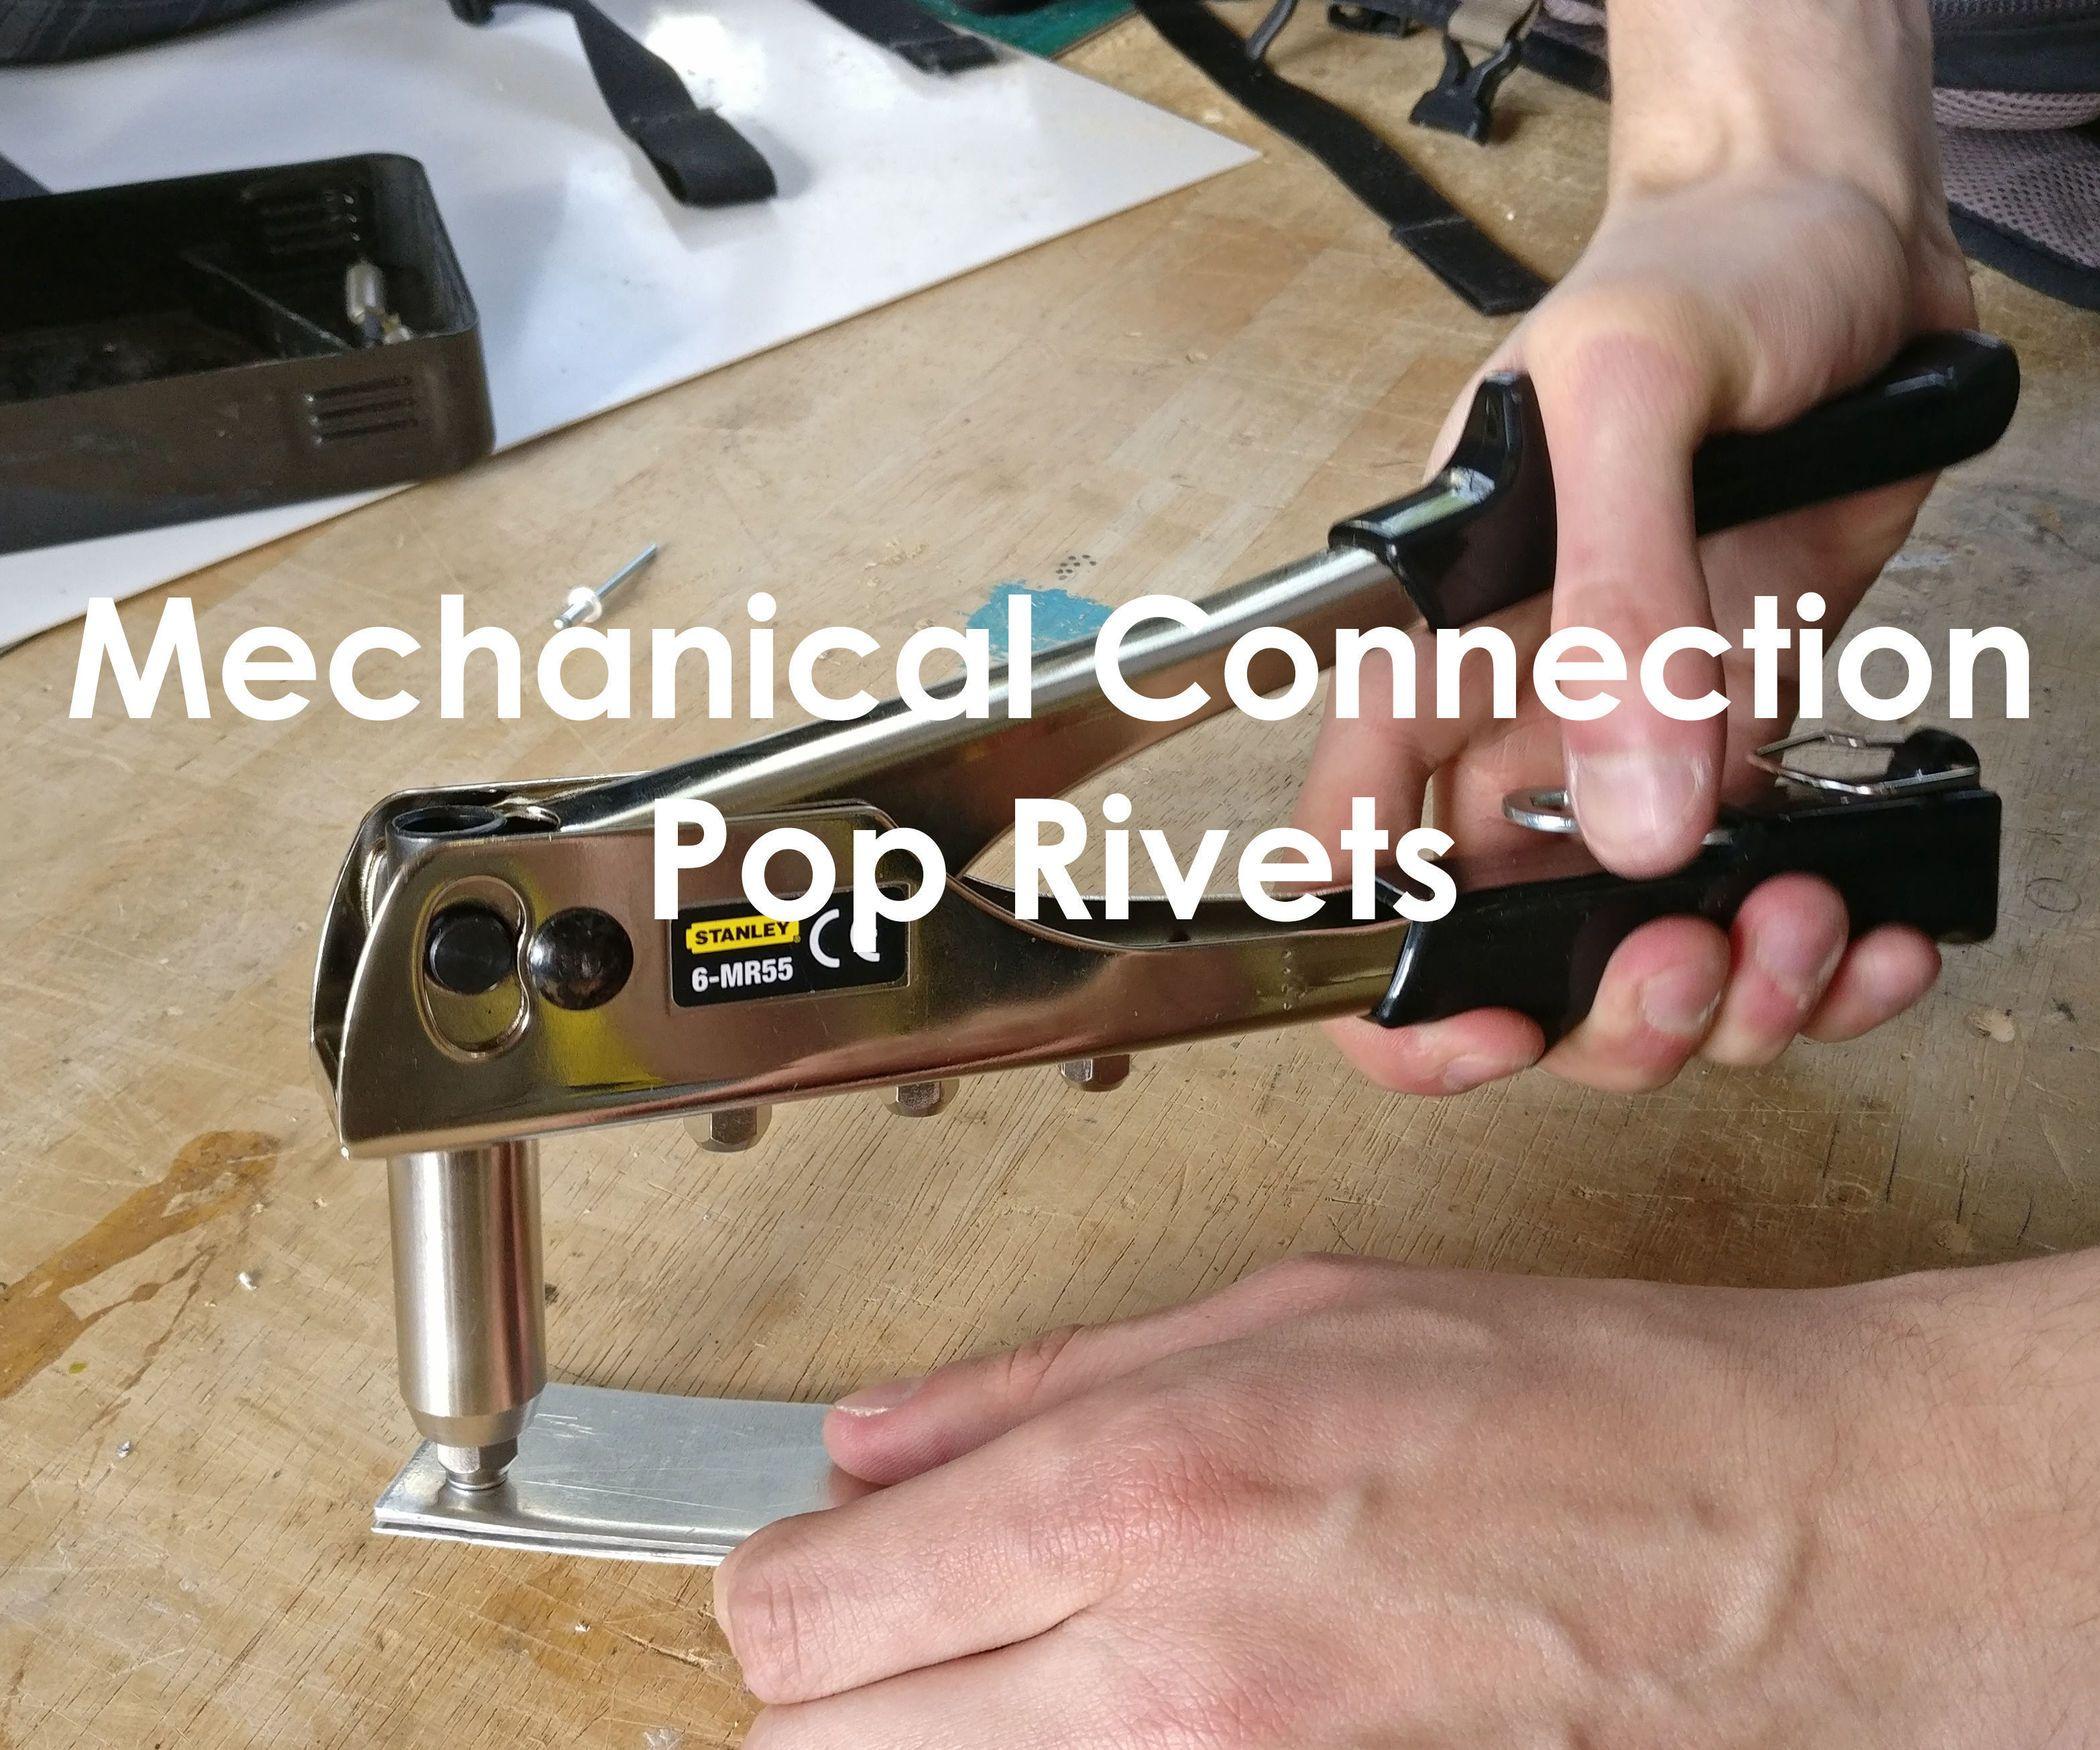 Mechanical Connection Pop Rivets Werkplaatsidc Rivets Metal Working Projects Metal Glue